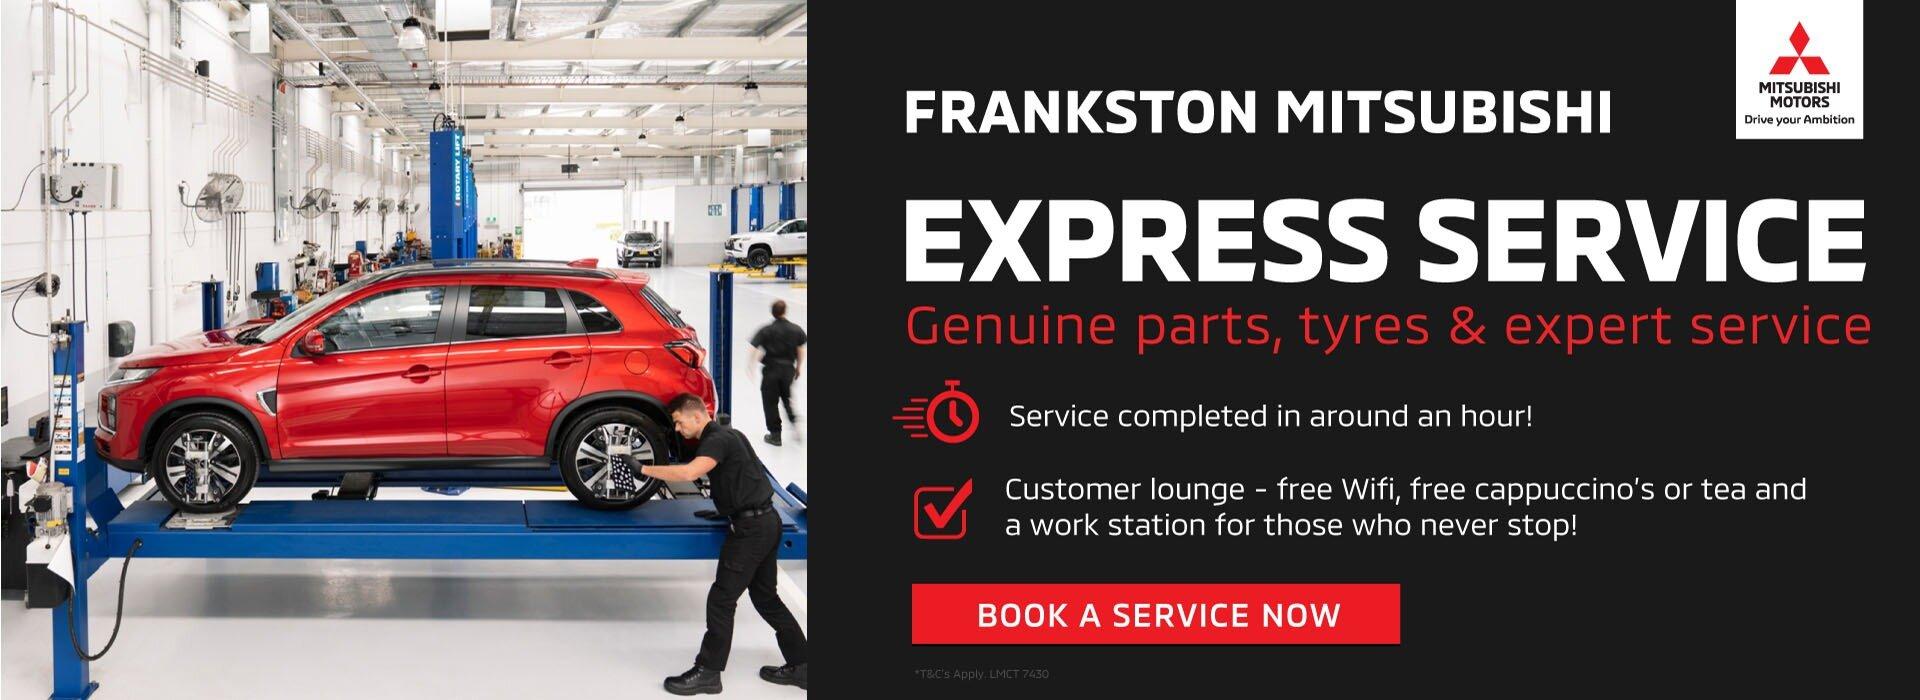 frankston-express-service